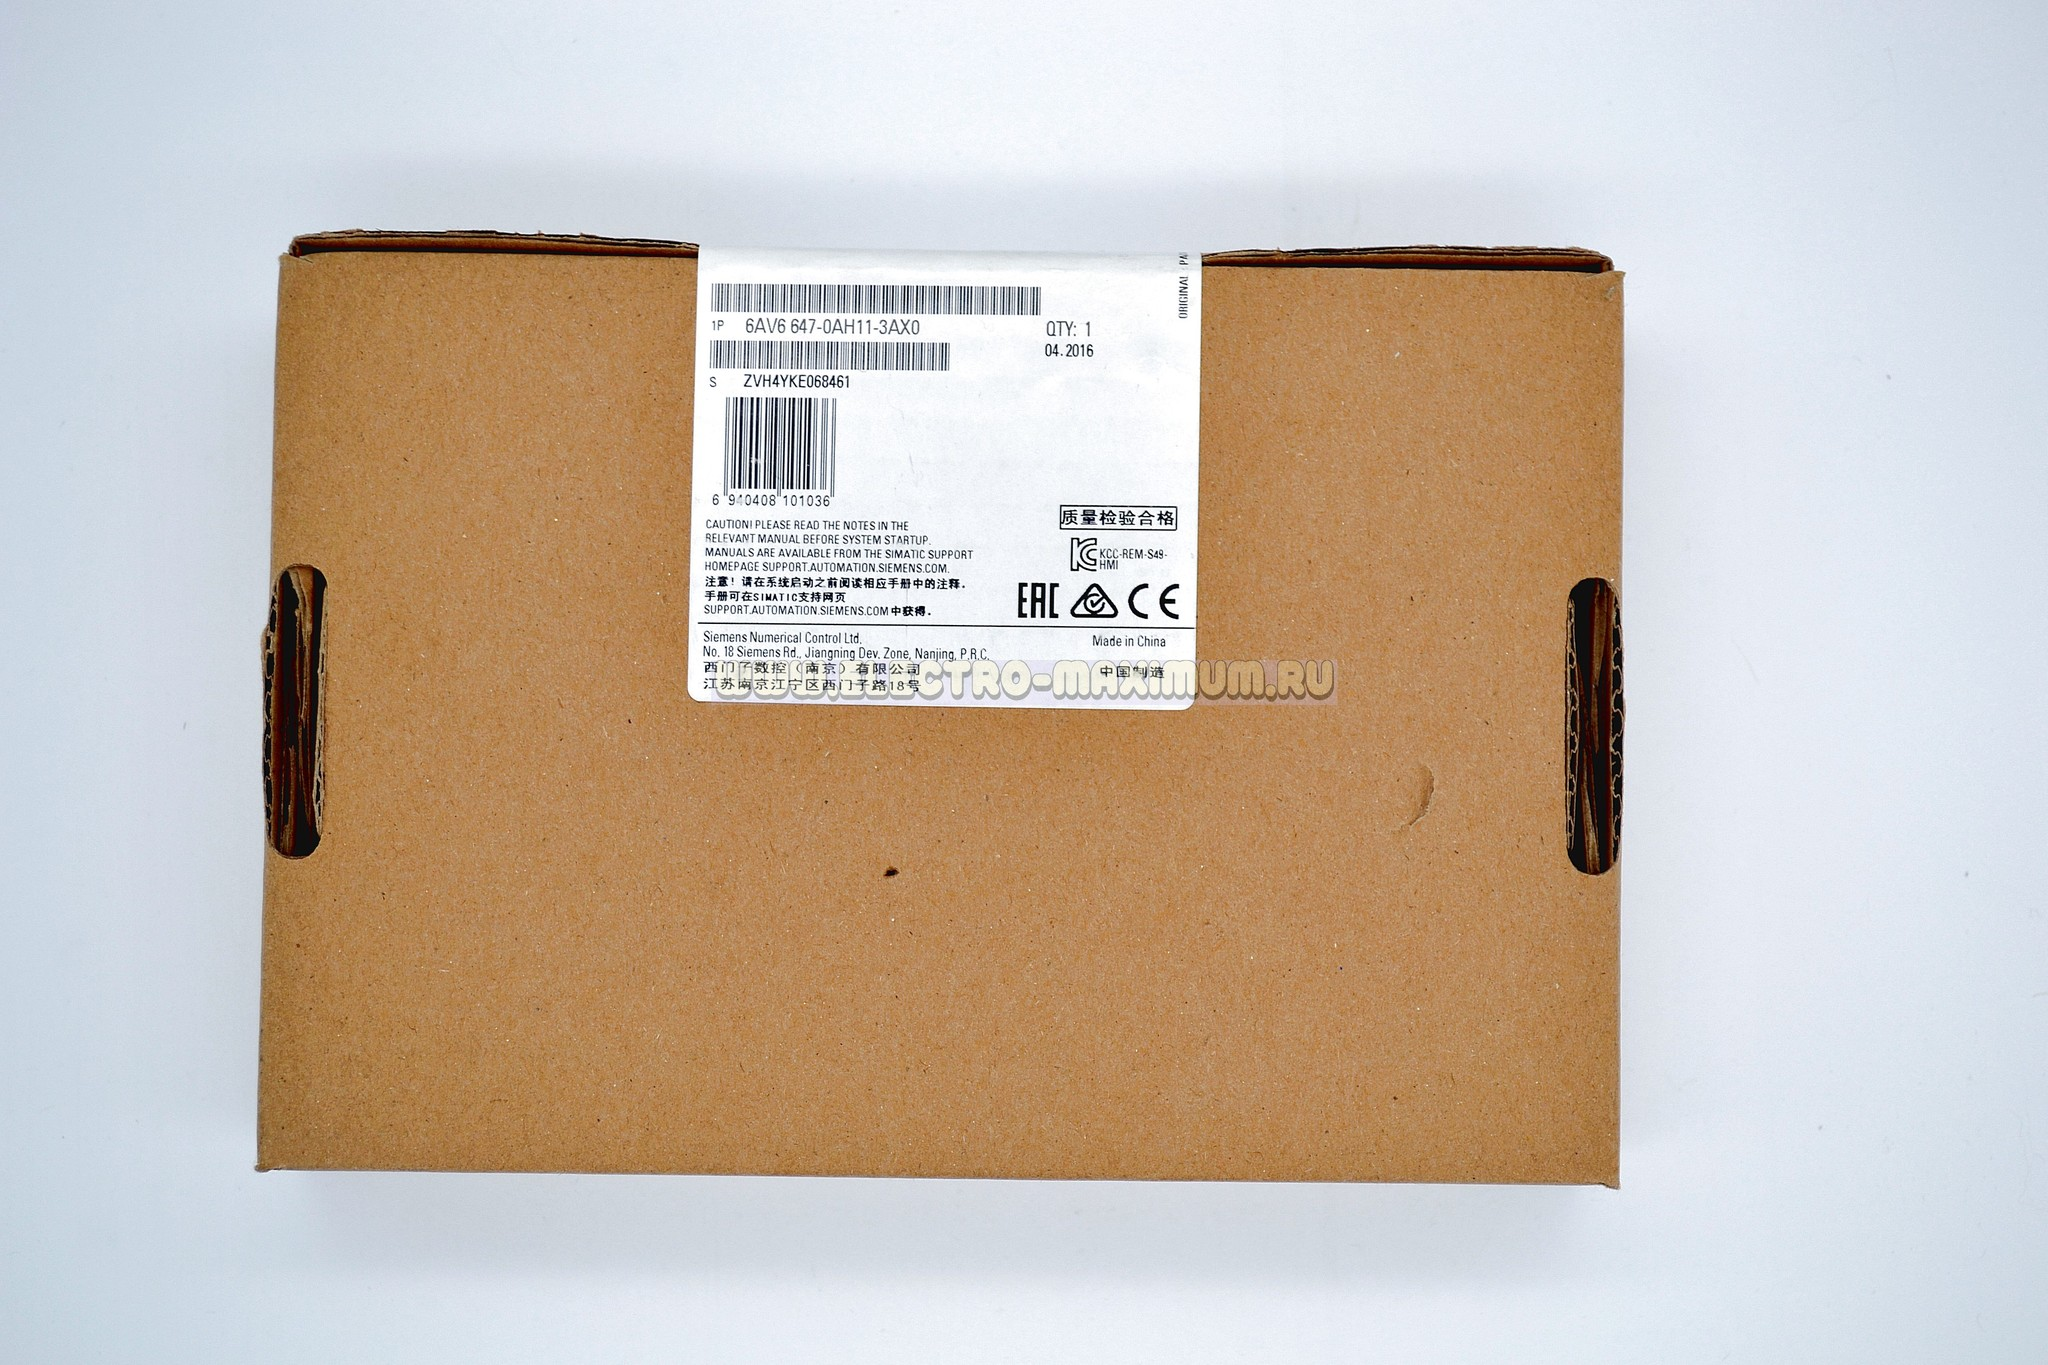 SIEMENS SIMATIC HMI KP300 Basic 6AV6 647-0AH11-3AX0